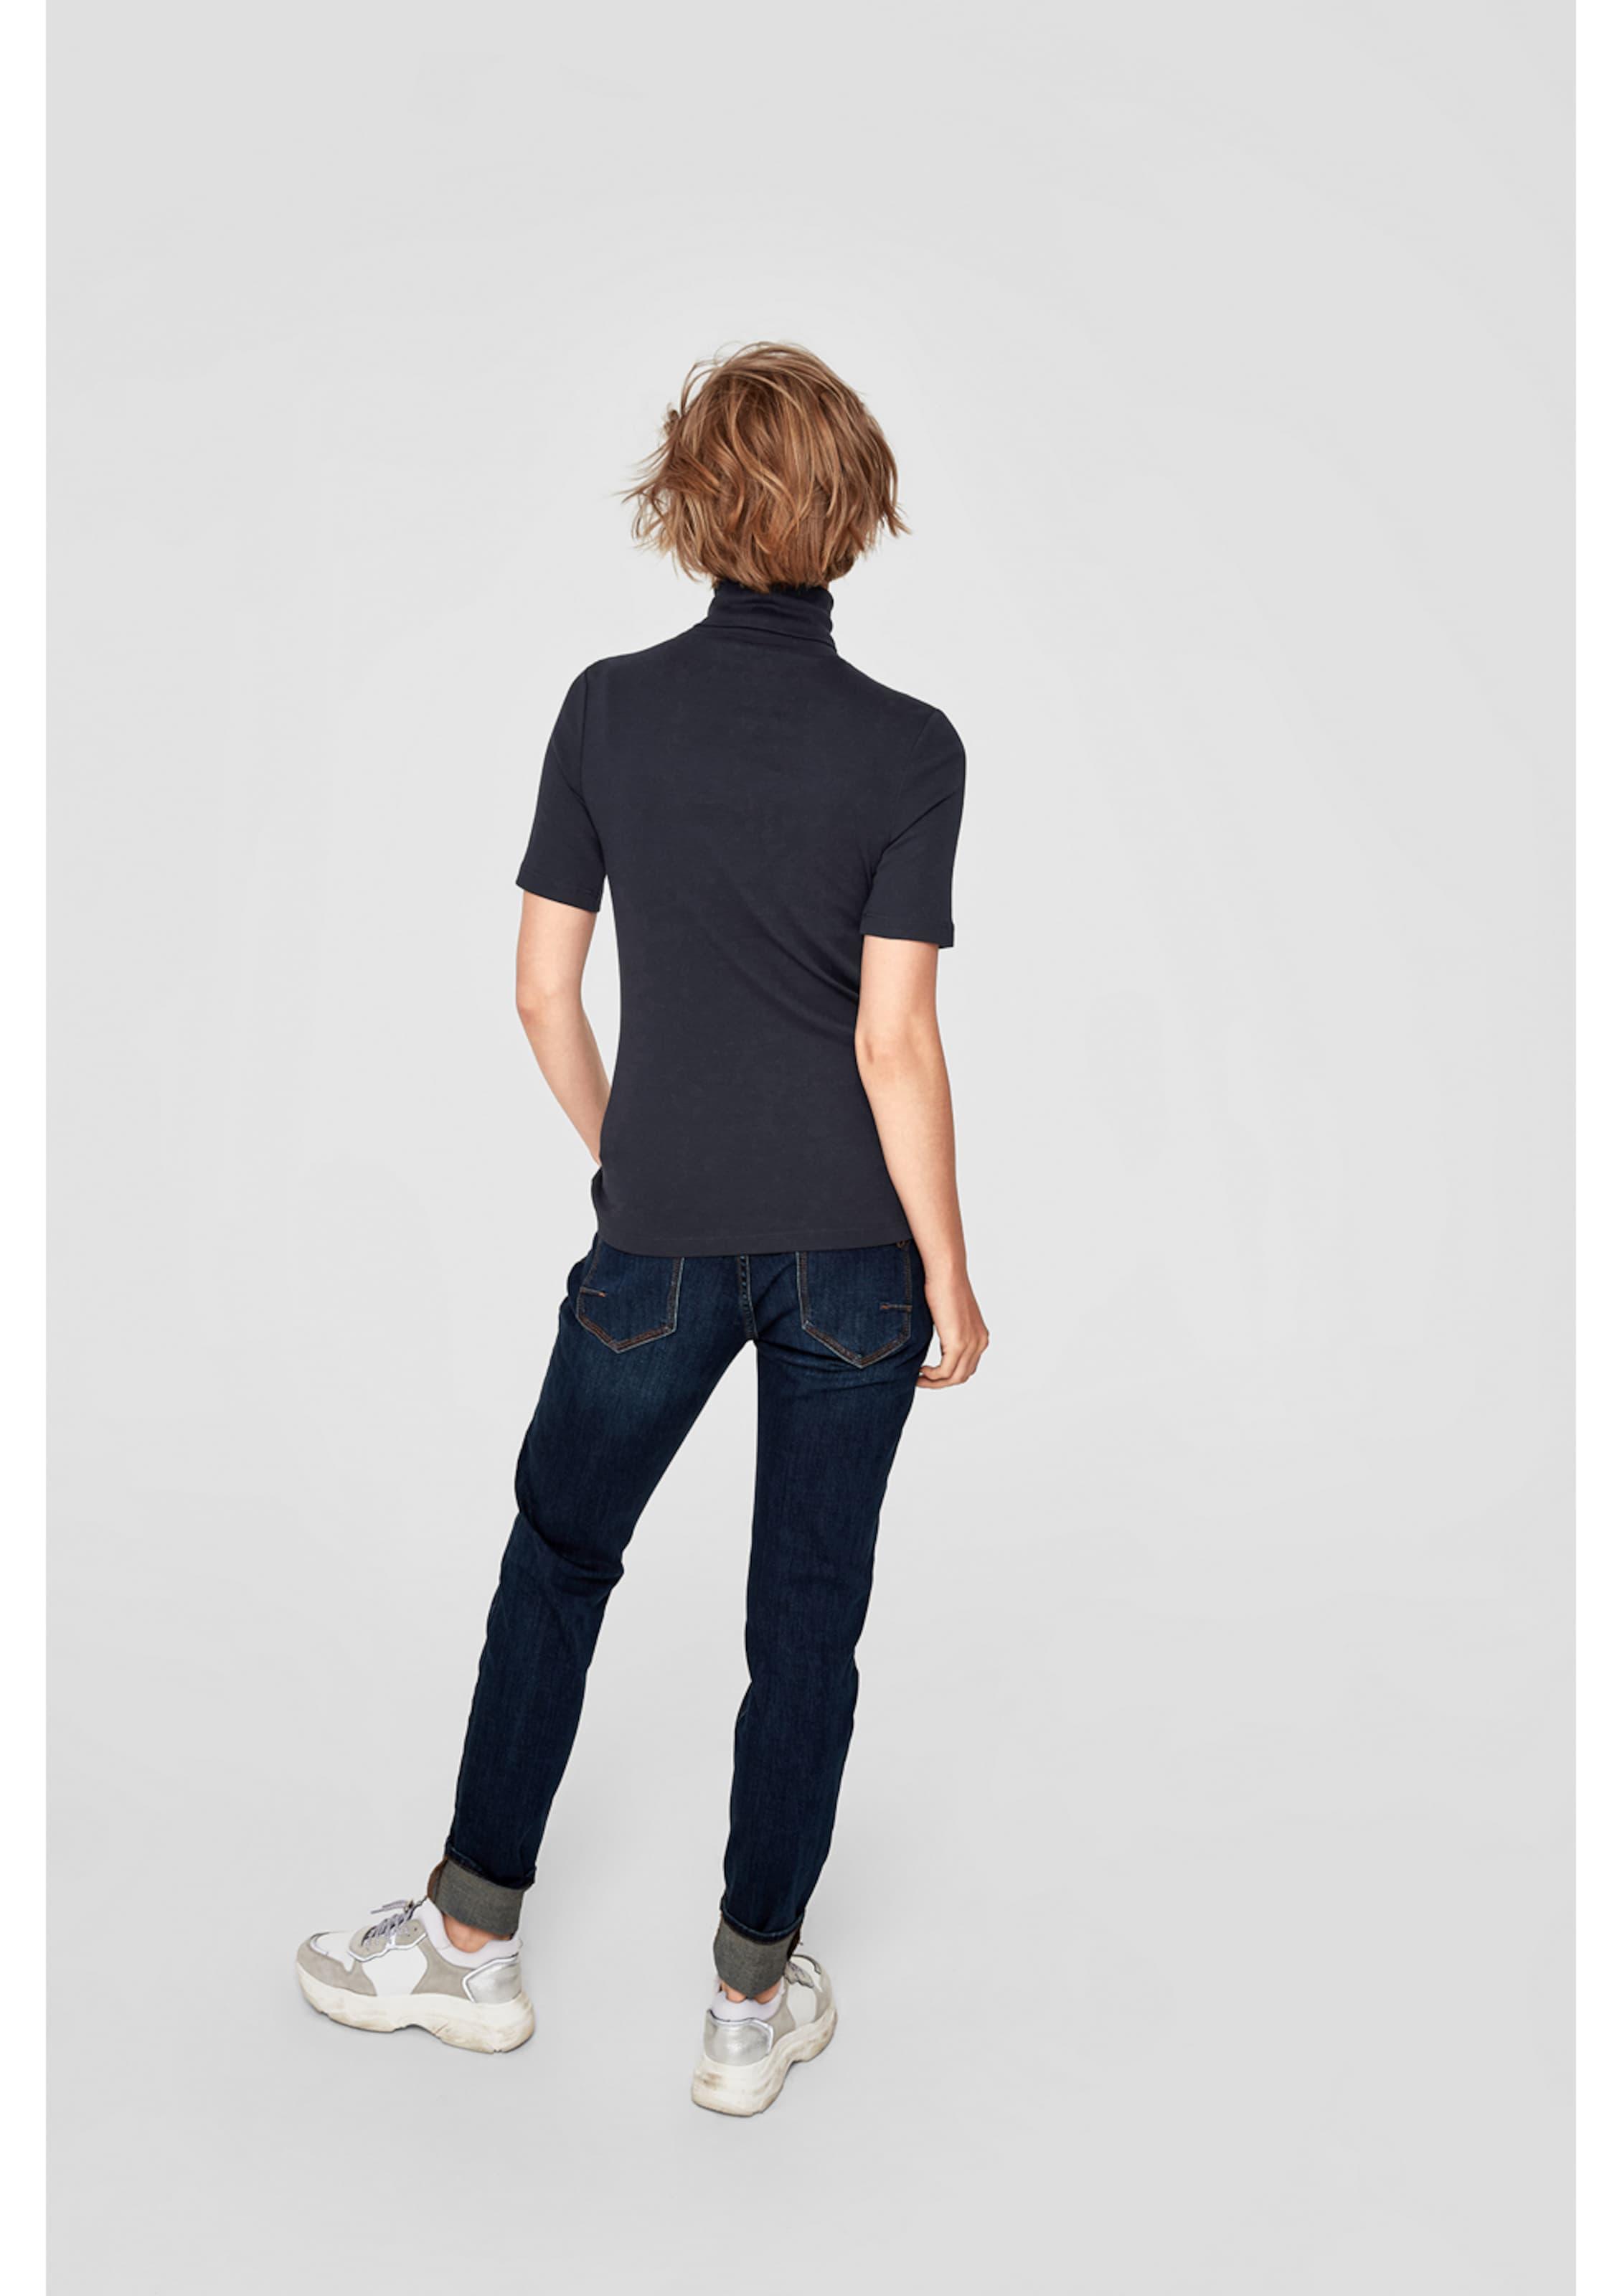 oliver Enzian In Label Shirt S Red vNOm0w8yn